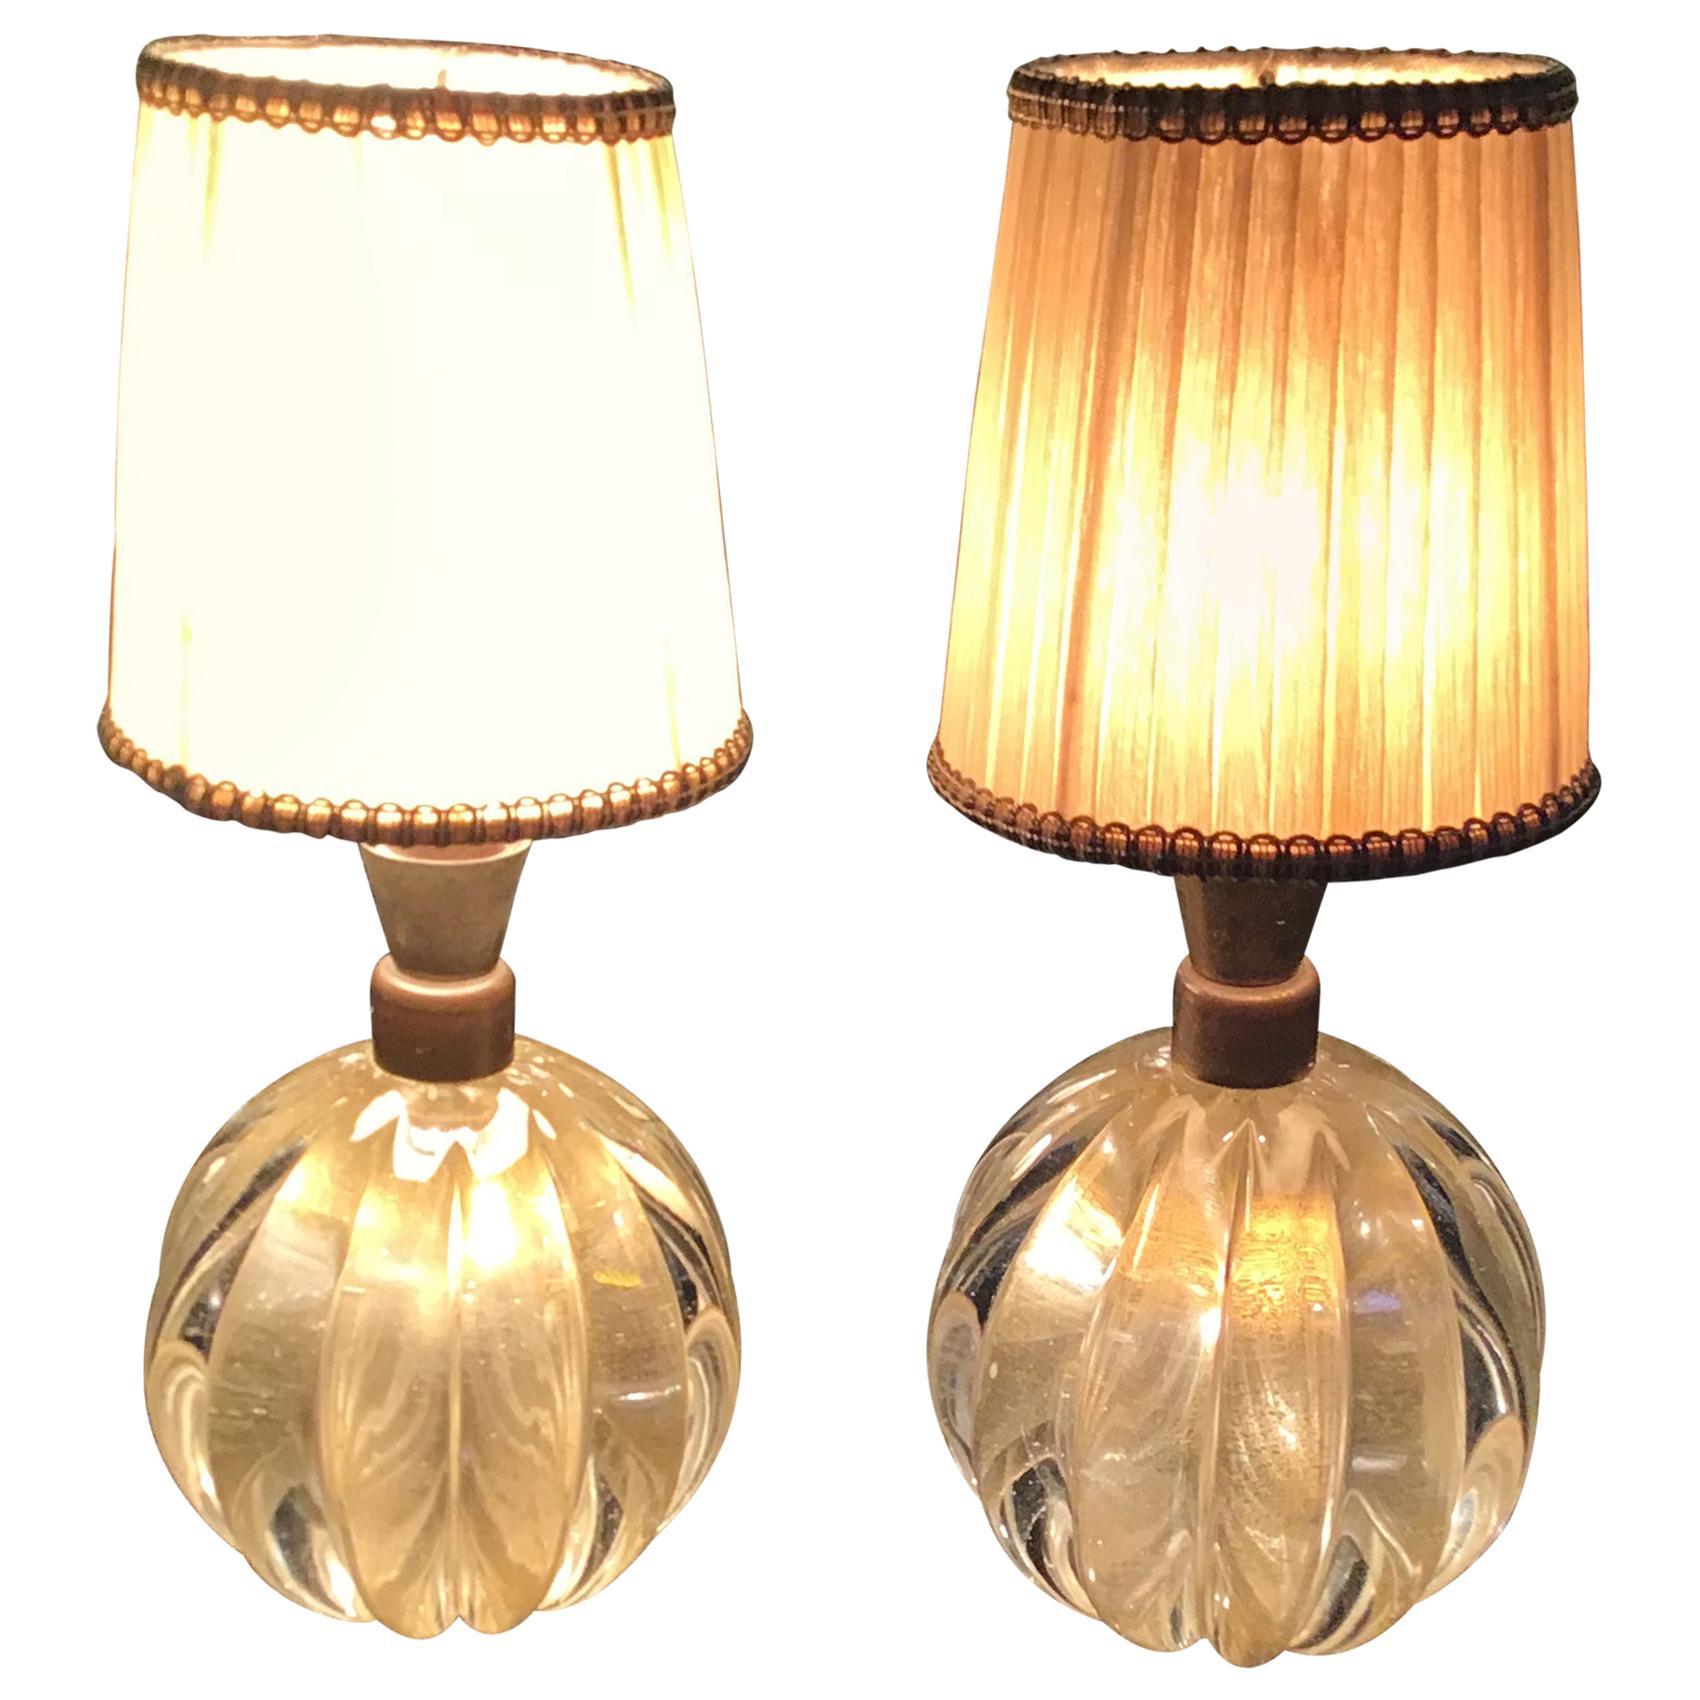 Seguso Couples Table Lamp Murano Glass Brass, 1940, Italy